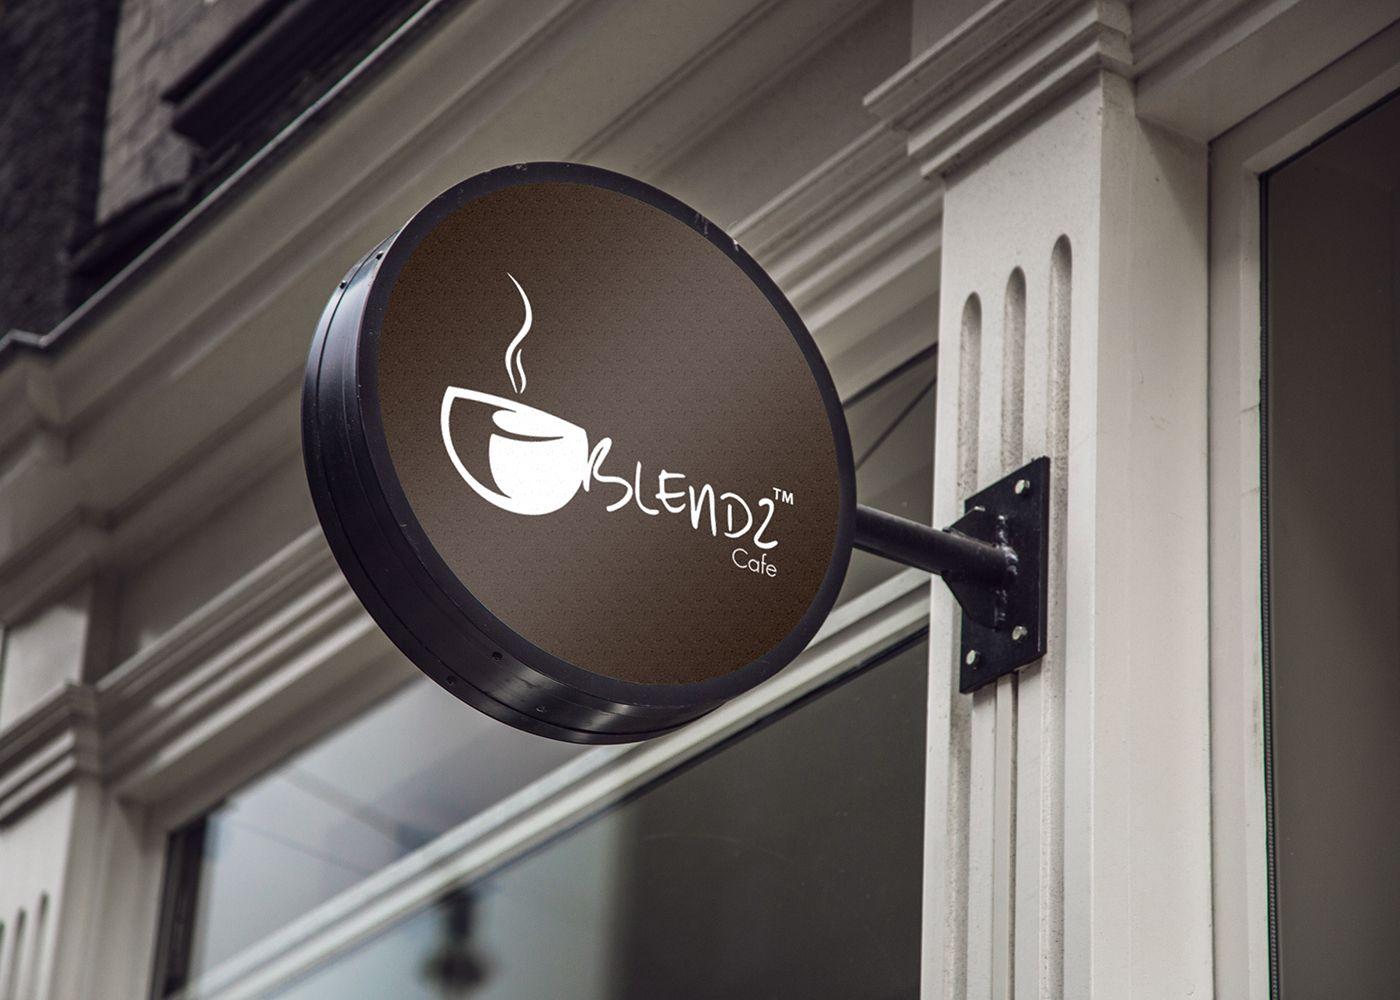 Download Check Out This Behance Project Blendz Cafe Logo Branding Https Www Behance Net Gallery 40718313 Ble Neon Box Coffee Shop Logo Design Logo Design Coffee